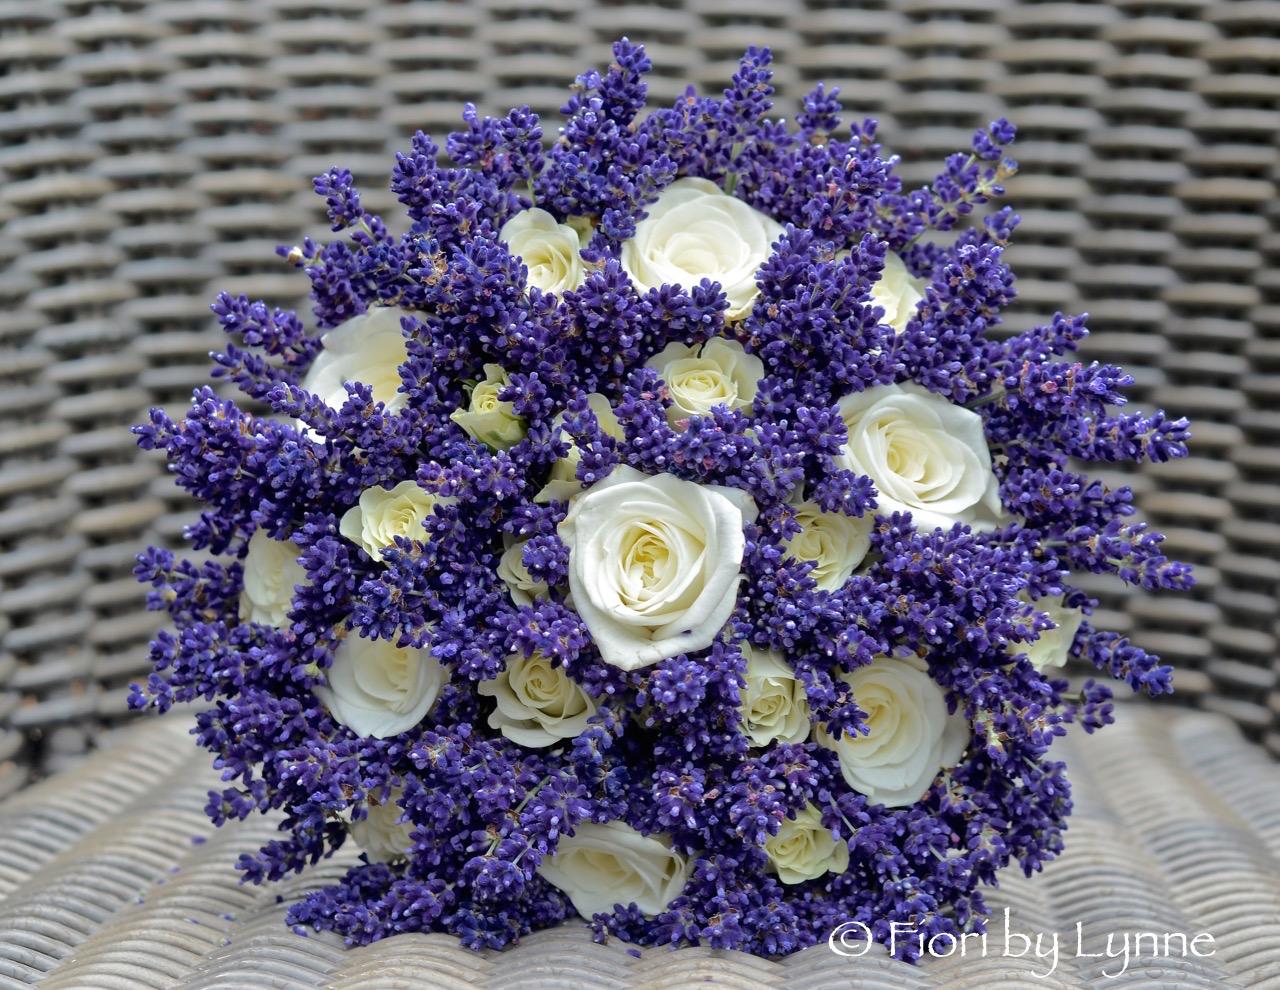 Wedding Flowers Blog: Kate\'s Secret Garden Themed Wedding Flowers ...